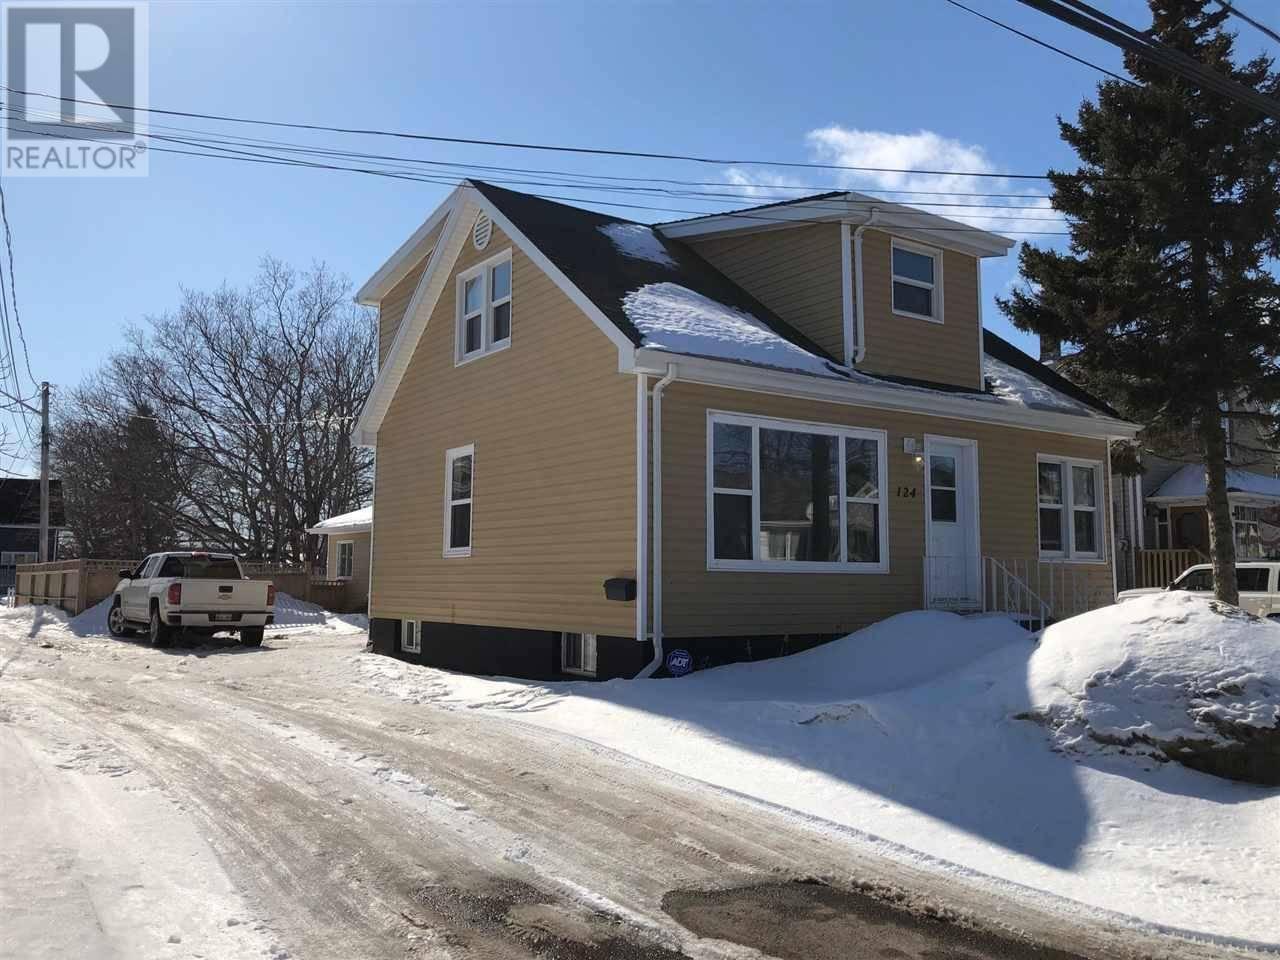 House for sale at 124 Harvard St Summerside Prince Edward Island - MLS: 202004176